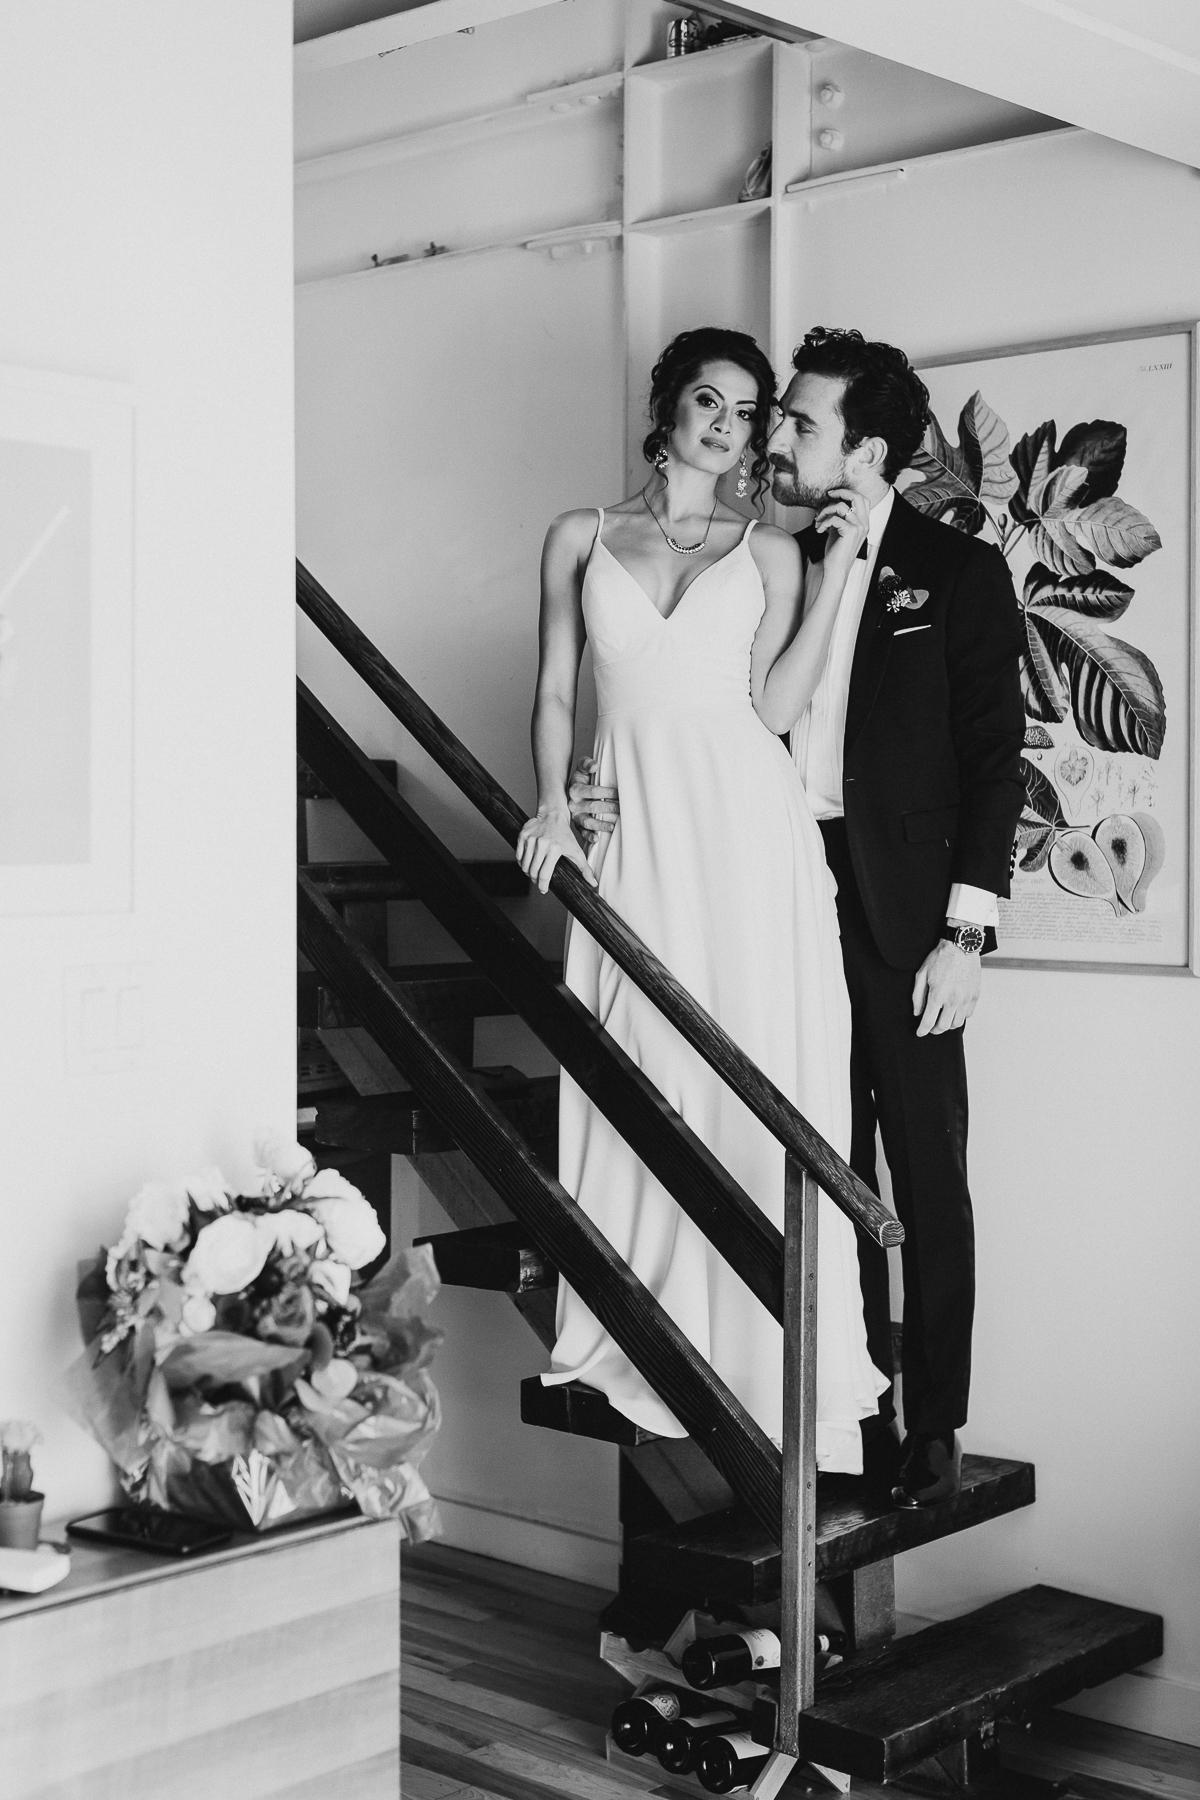 Humboldt-&-Jackson-Restaurant-Intimate-Brooklyn-Documentary-Wedding-Photographer-18.jpg